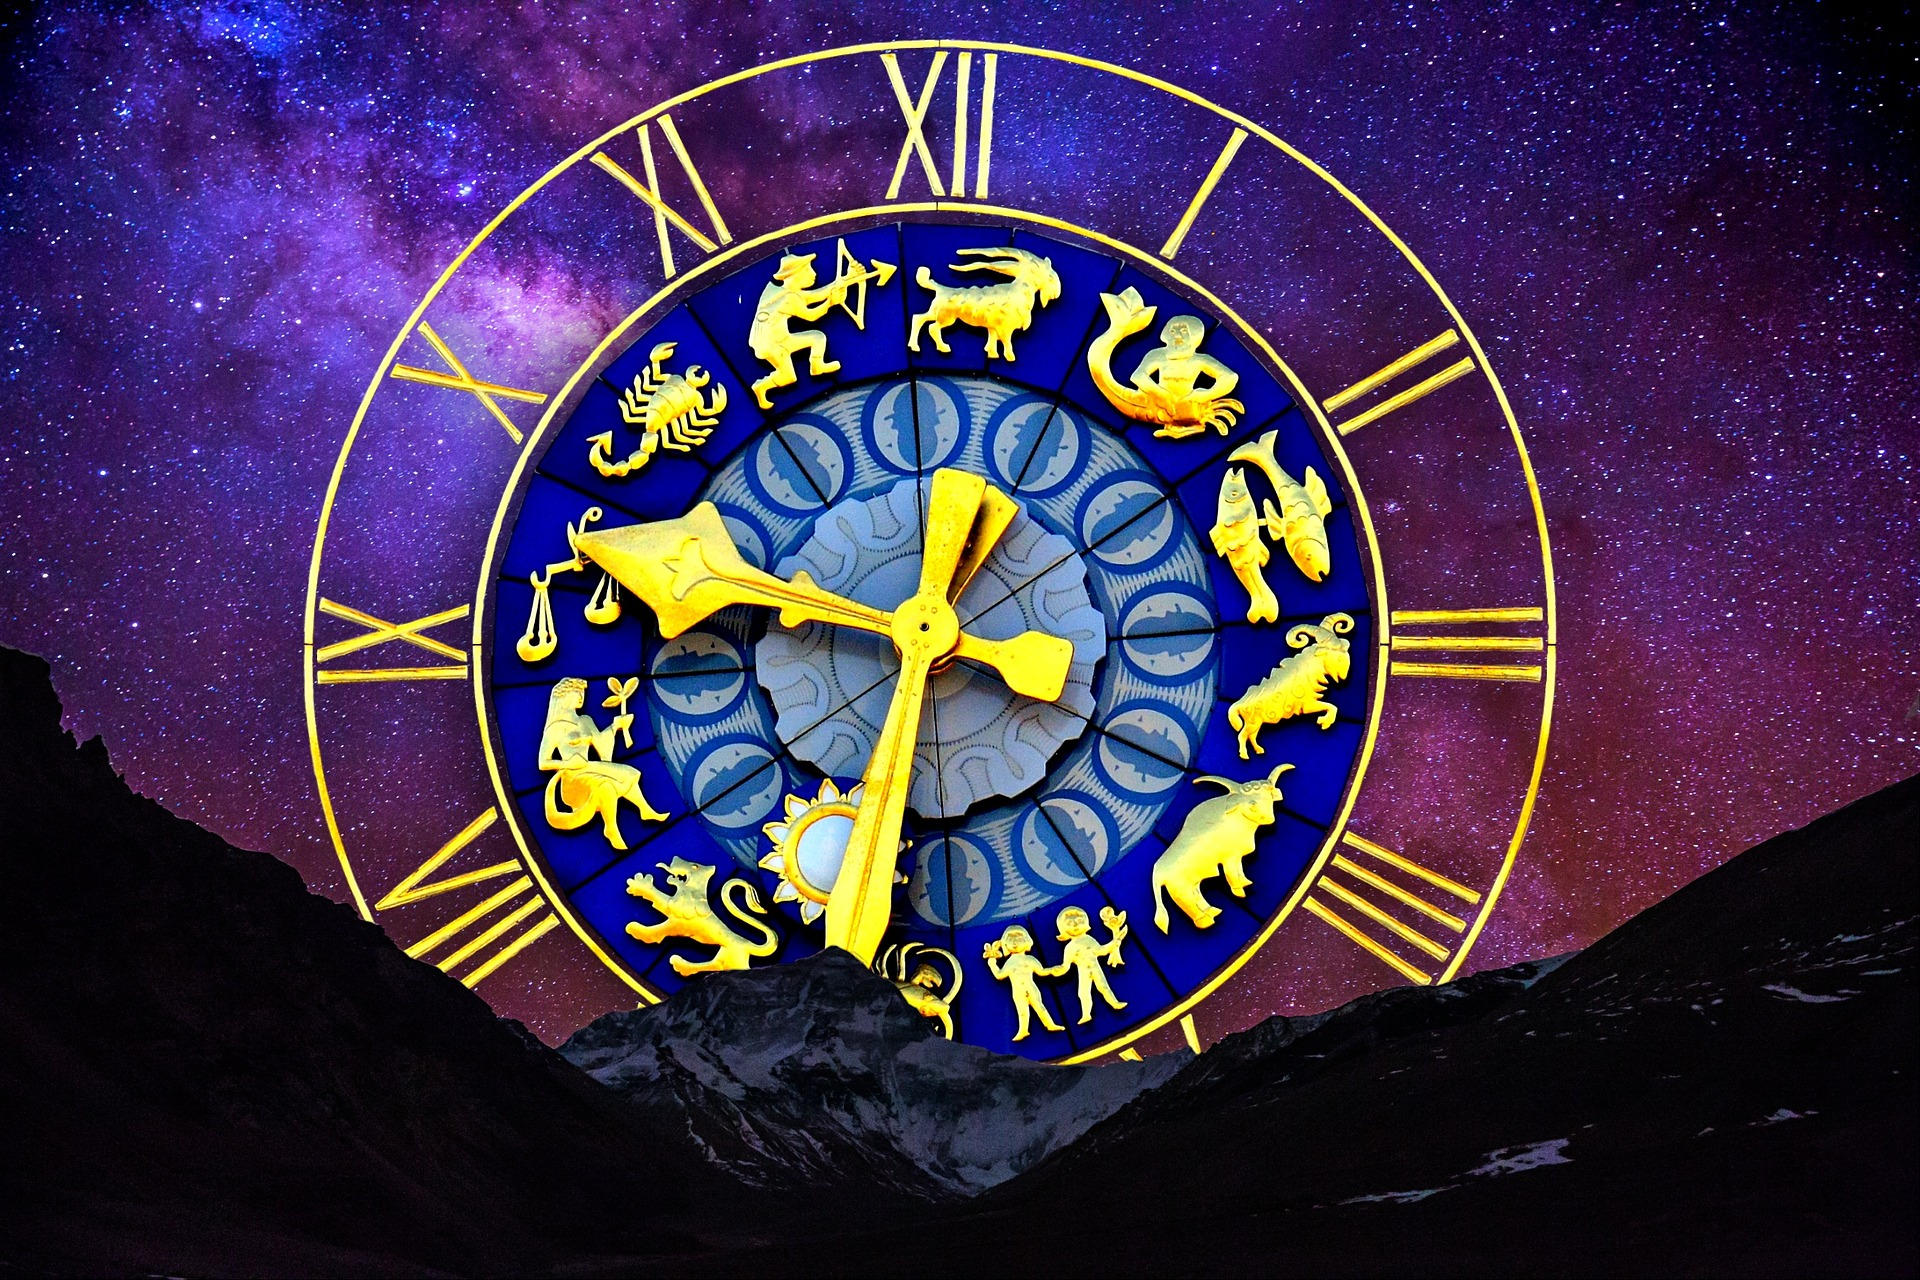 horoscop zilnic - sfatulparintilor.ro - pixabay_com - starry-sky-2533021_1920